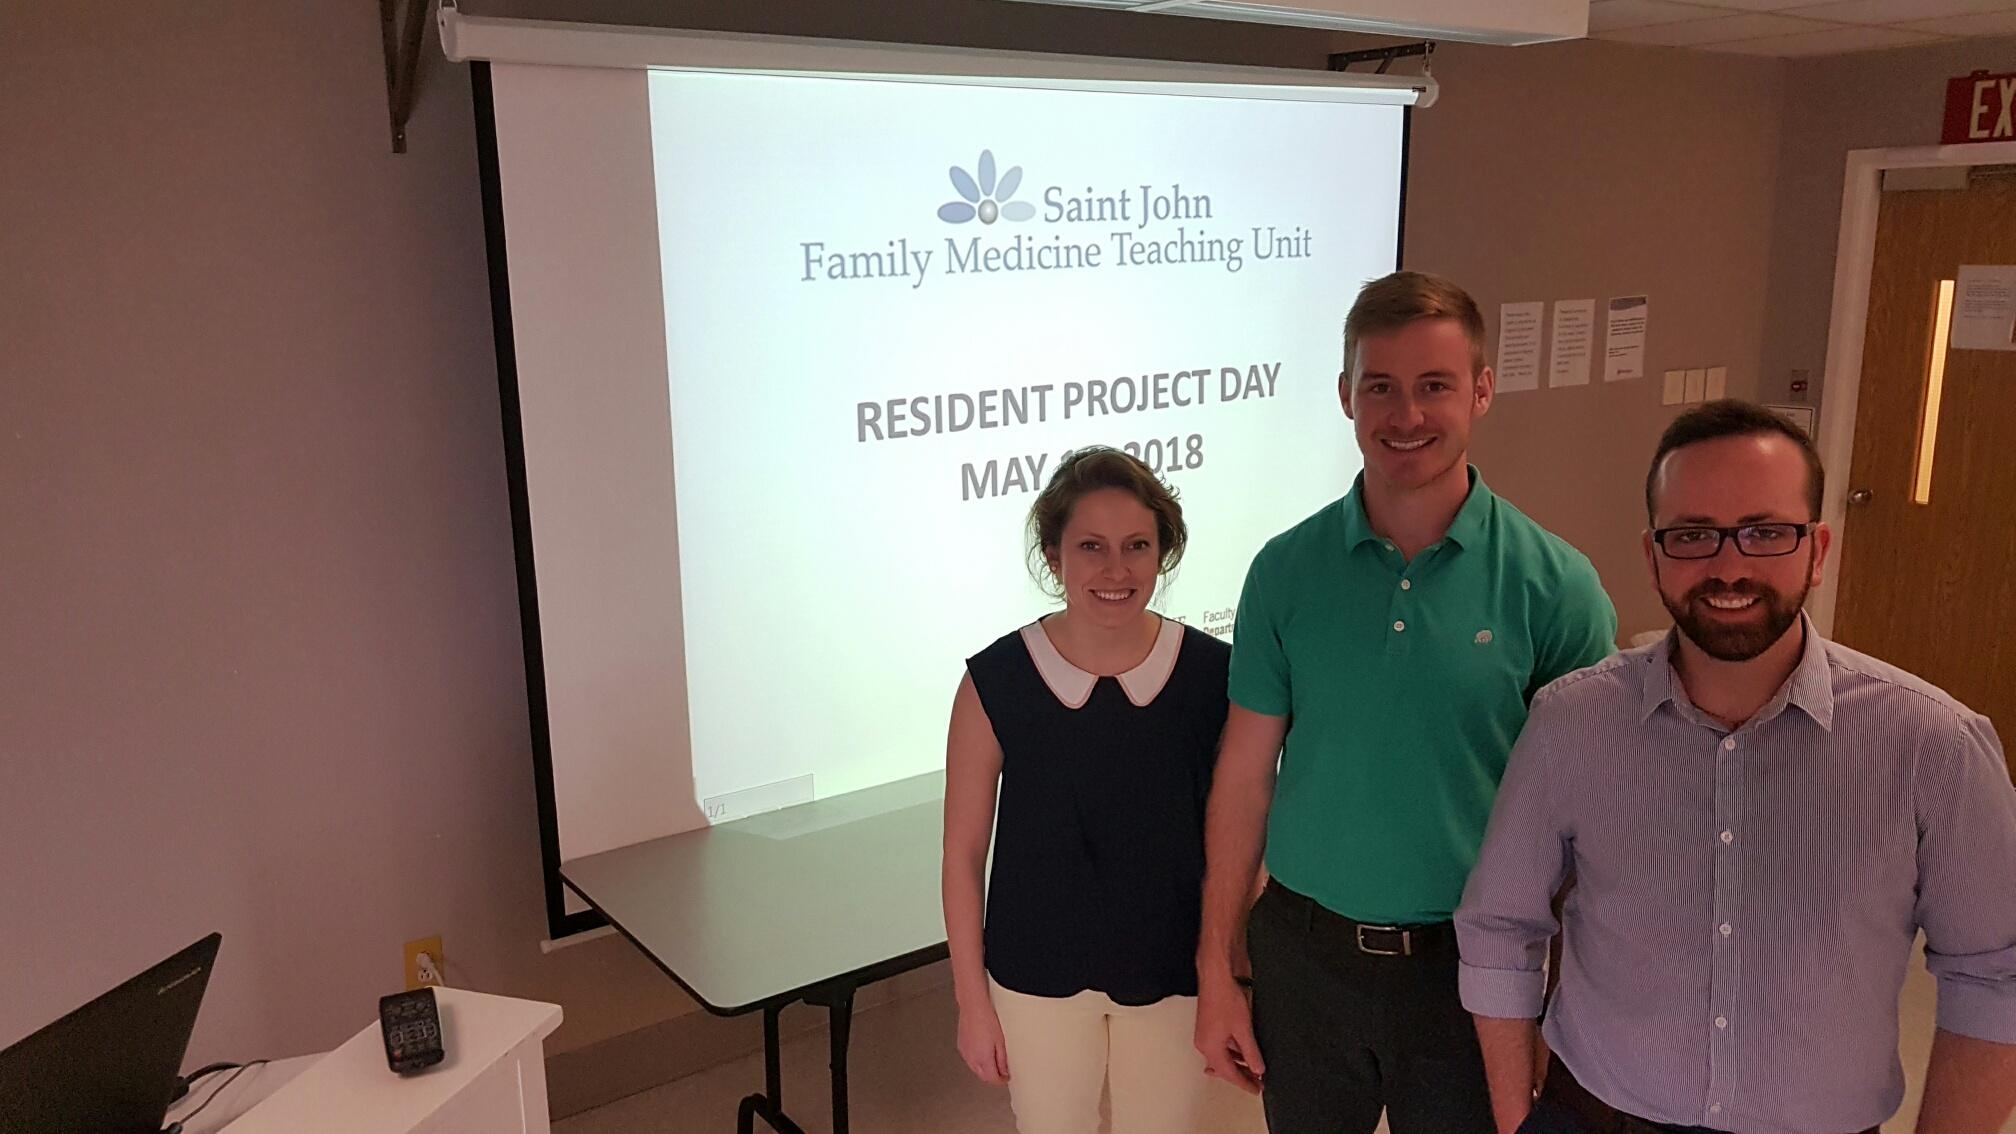 Saint John WA Single Women Over 50